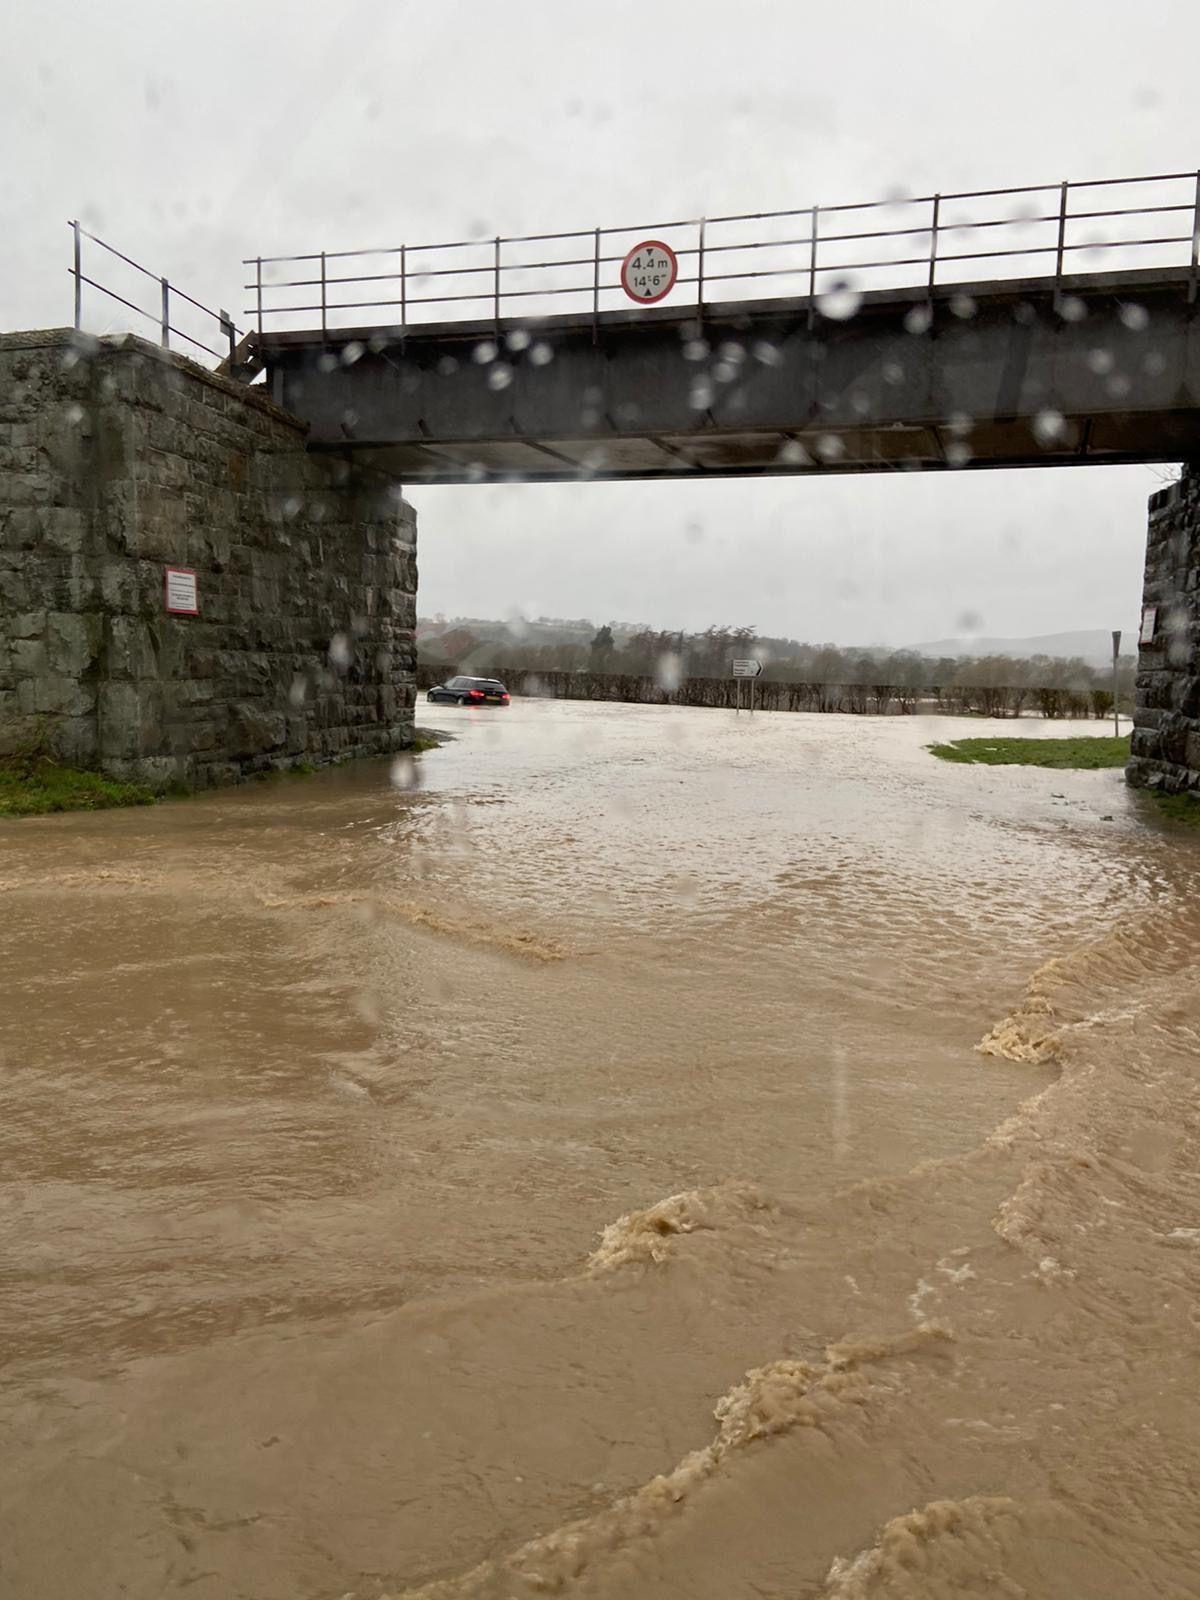 The railway bridge at Caerhowel. Photo: Matthew Livermore.